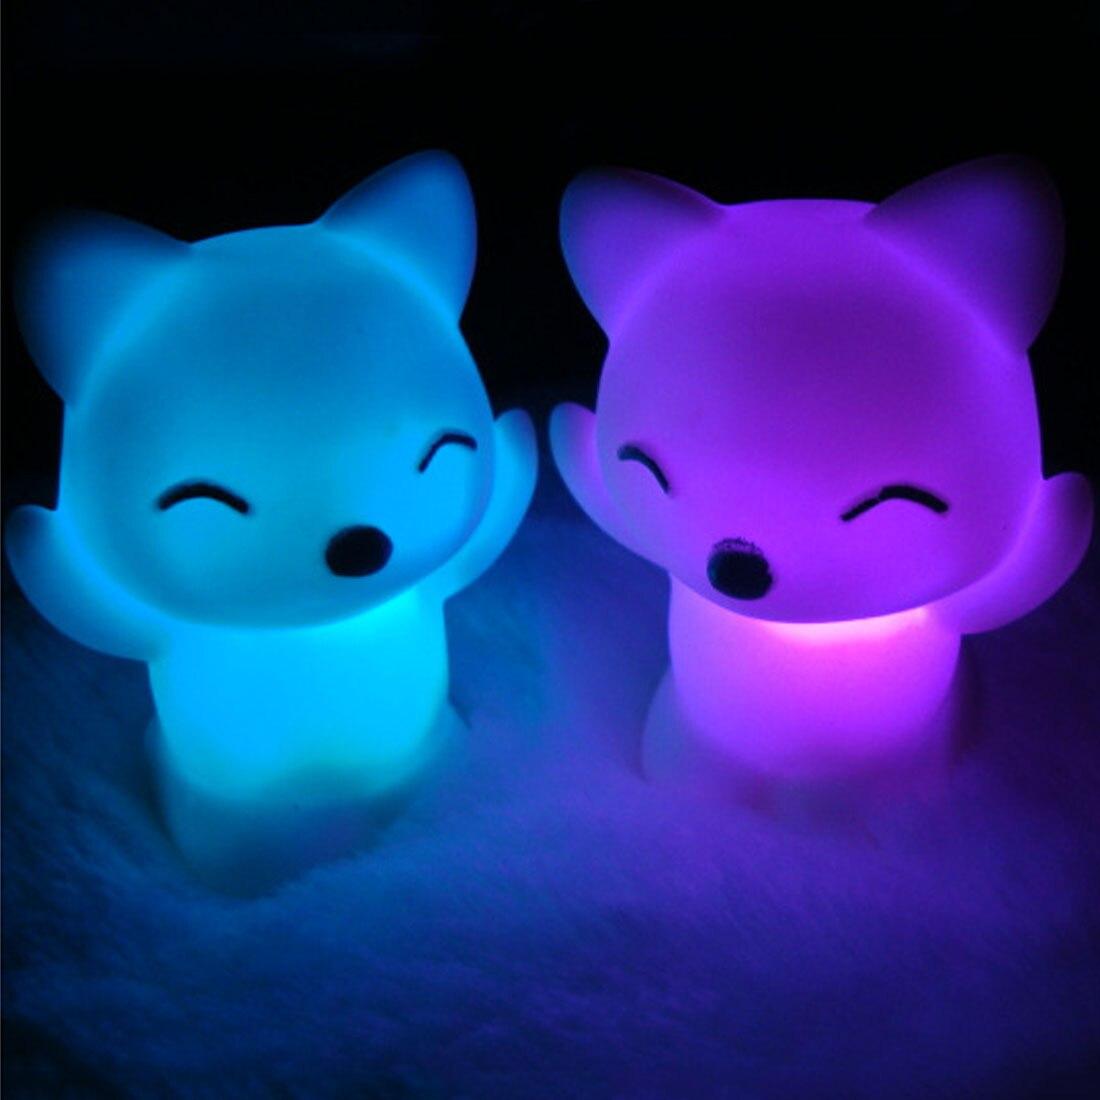 7 zmiana kolorów piękny kształt lisa LED Light Button bateria Home Decoration Fox kolorowe latarnia lampka nocna LED lampka nocna